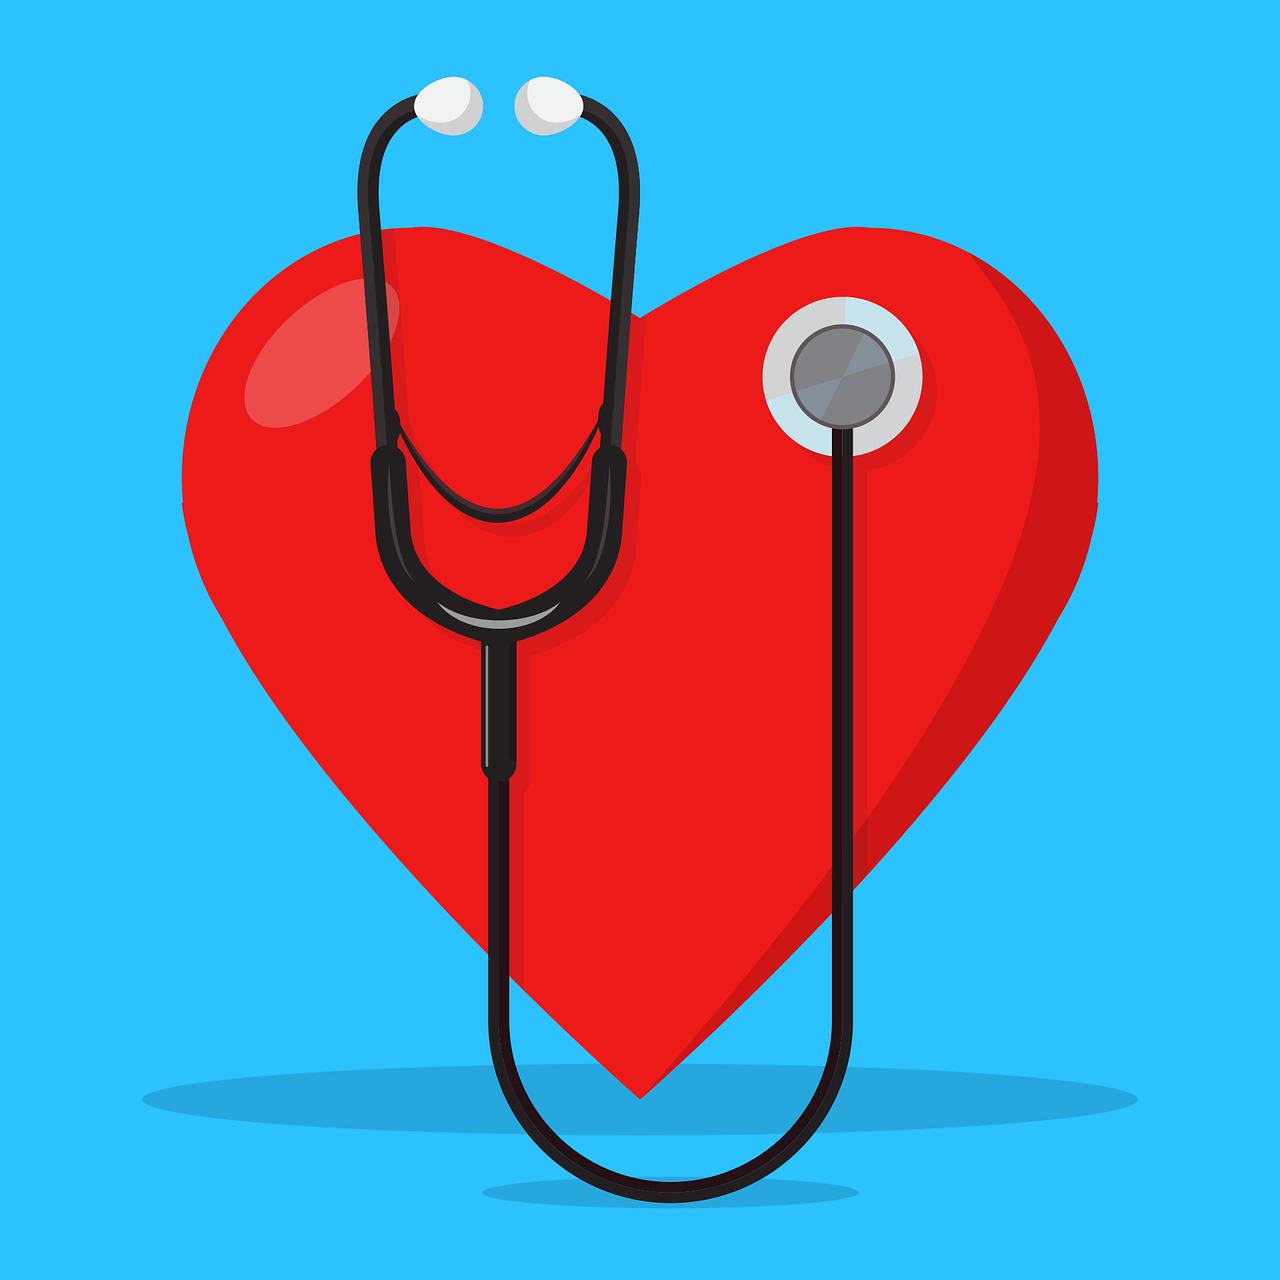 stethoscope-5355233 1280